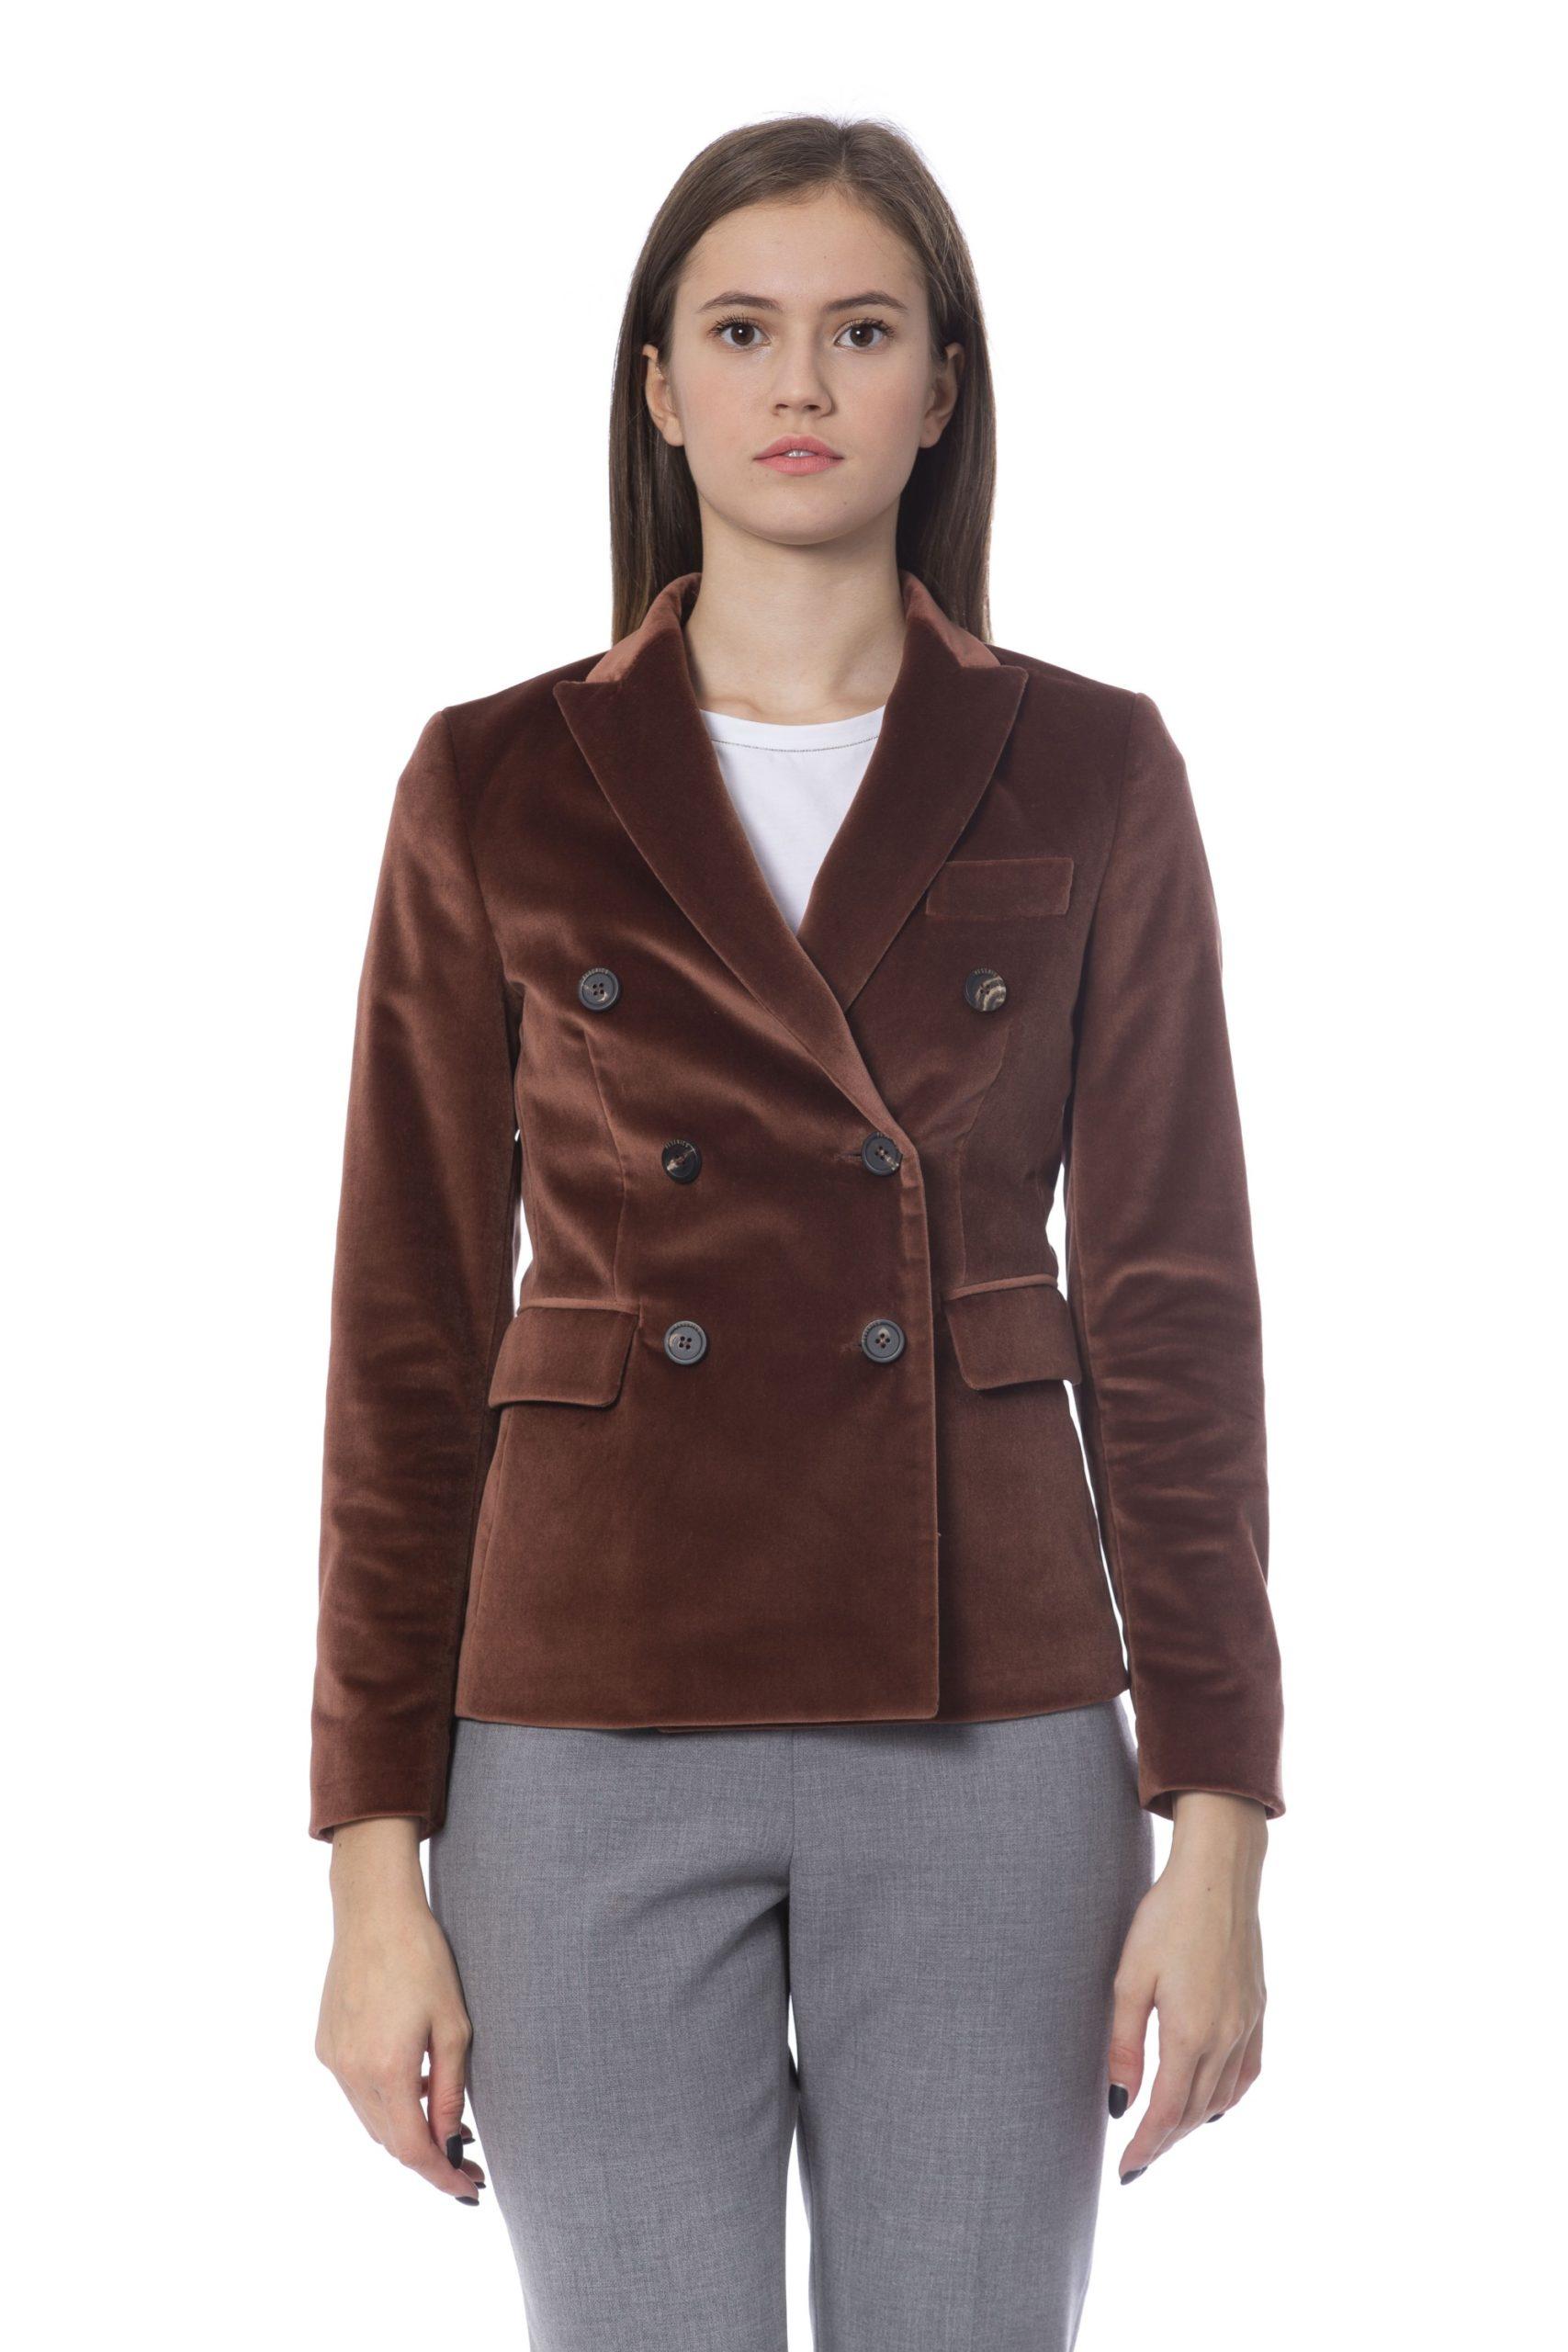 Peserico Women's Jacket Brown PE854368 - IT42 | S